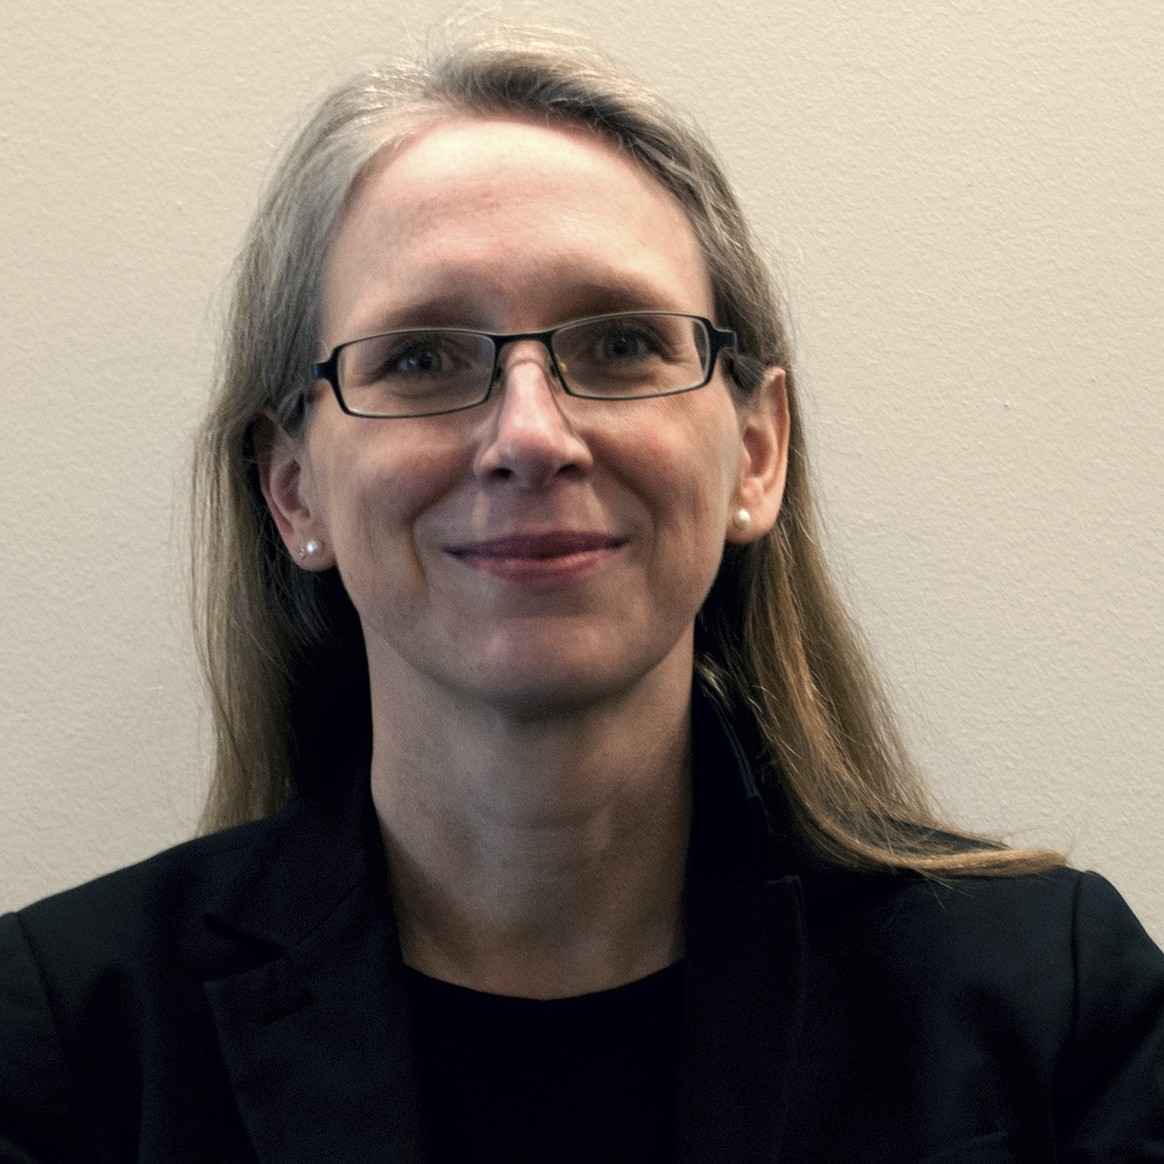 Headshot of Penn State Stuckeman Professor of Advanced Design Studies in the Department of Architecture Ute Poerschke